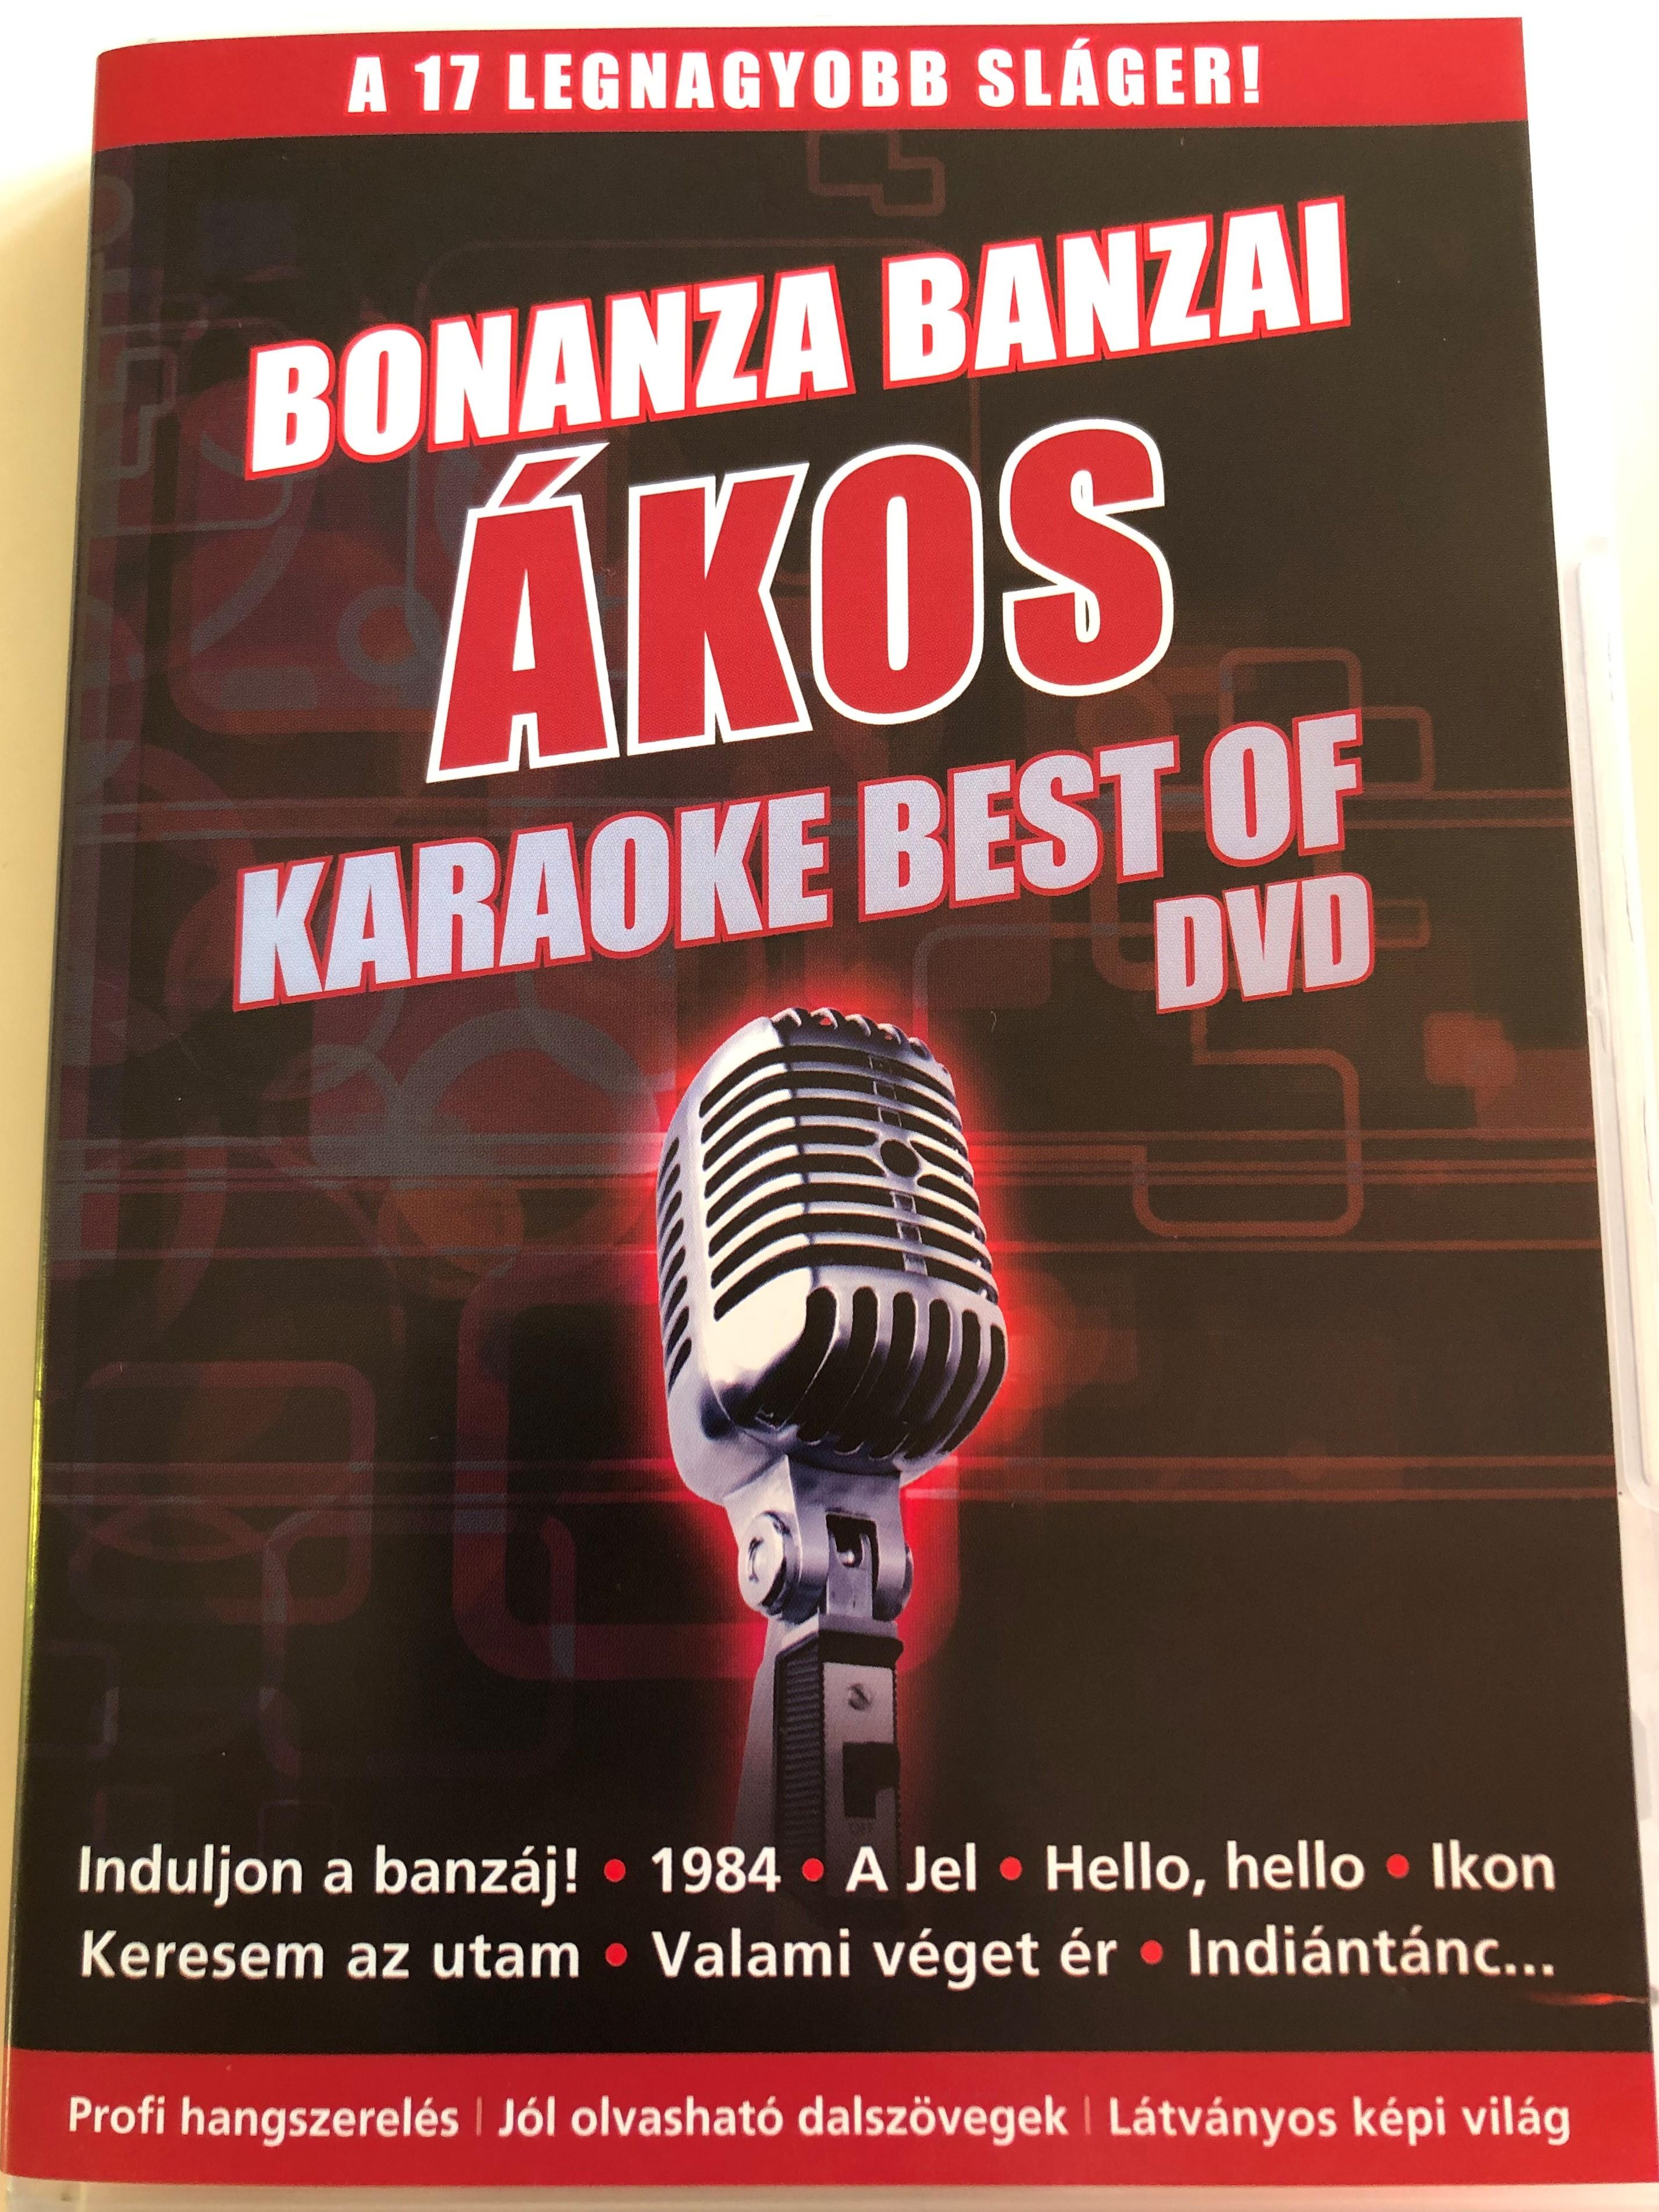 -kos-karaoke-best-of-dvd-2012-bonanza-banzai-a-17-legnagyobb-sl-ger-1.jpg